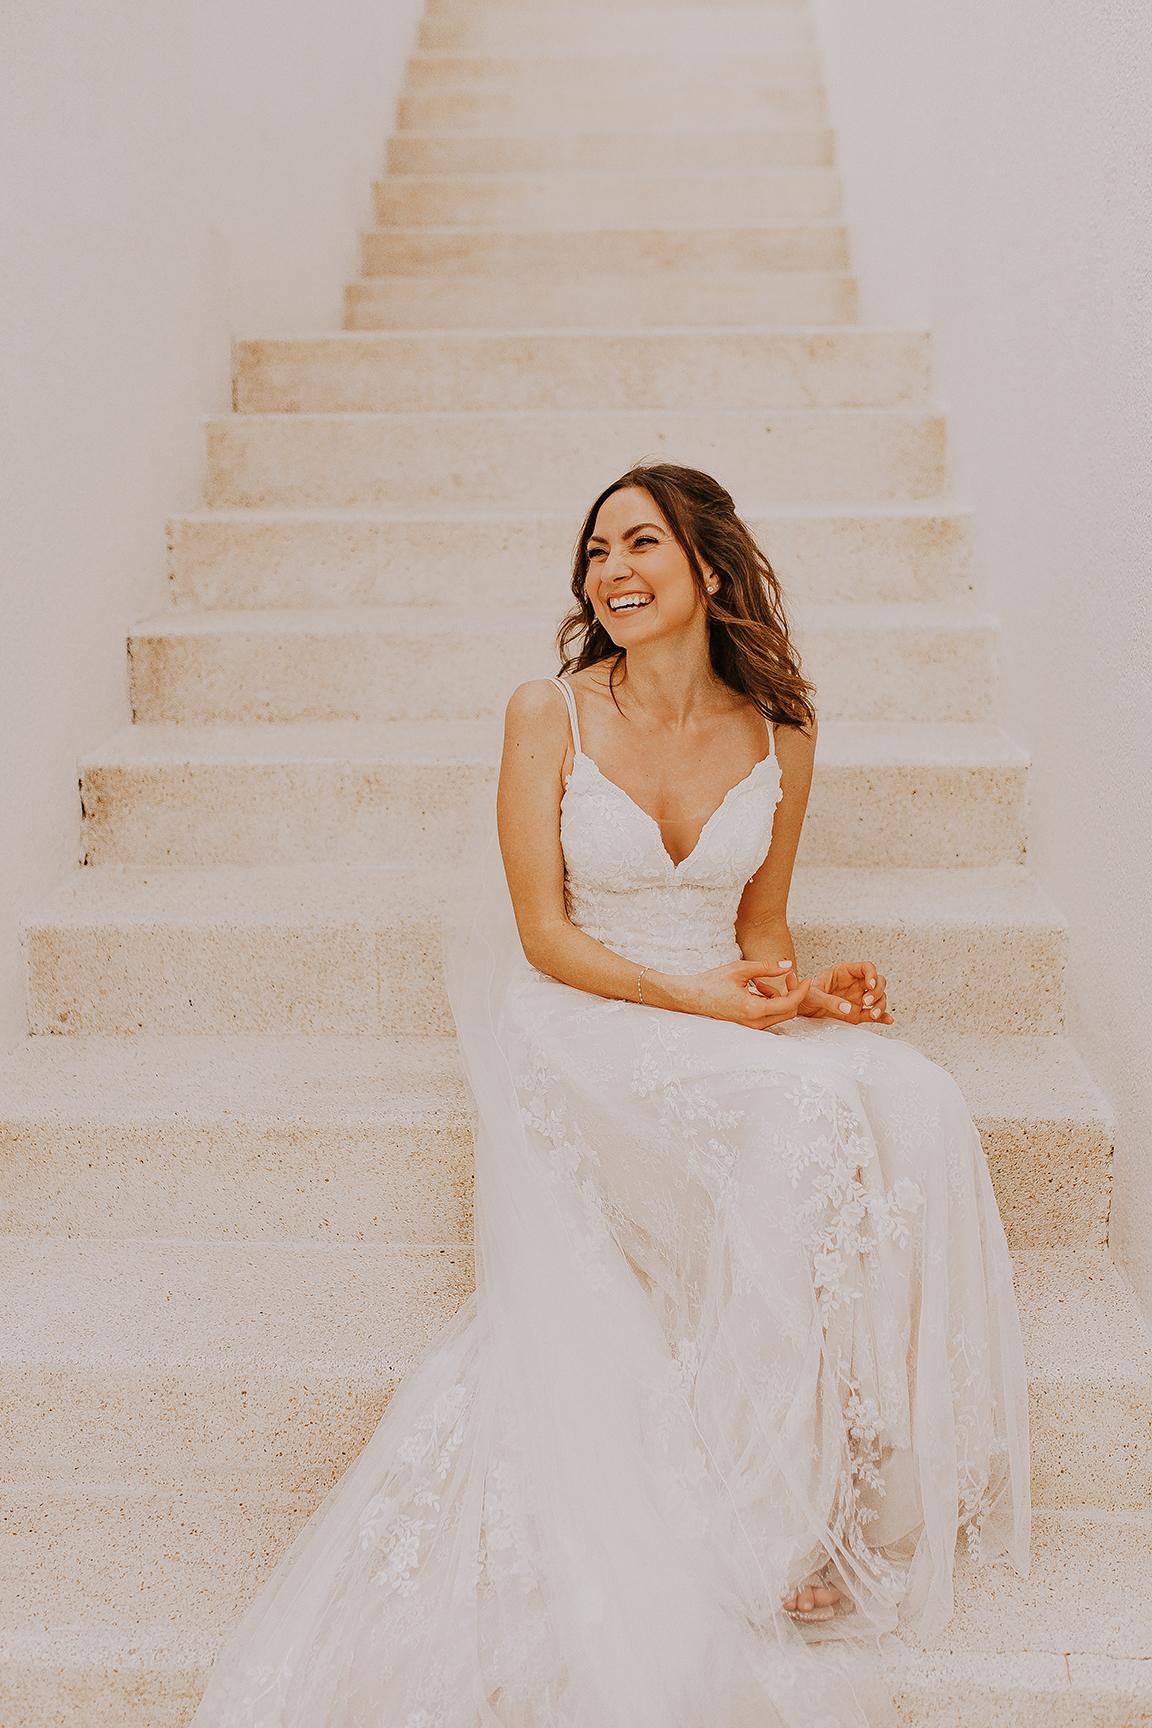 Lindsei+James_cabo_wedding_478.jpg